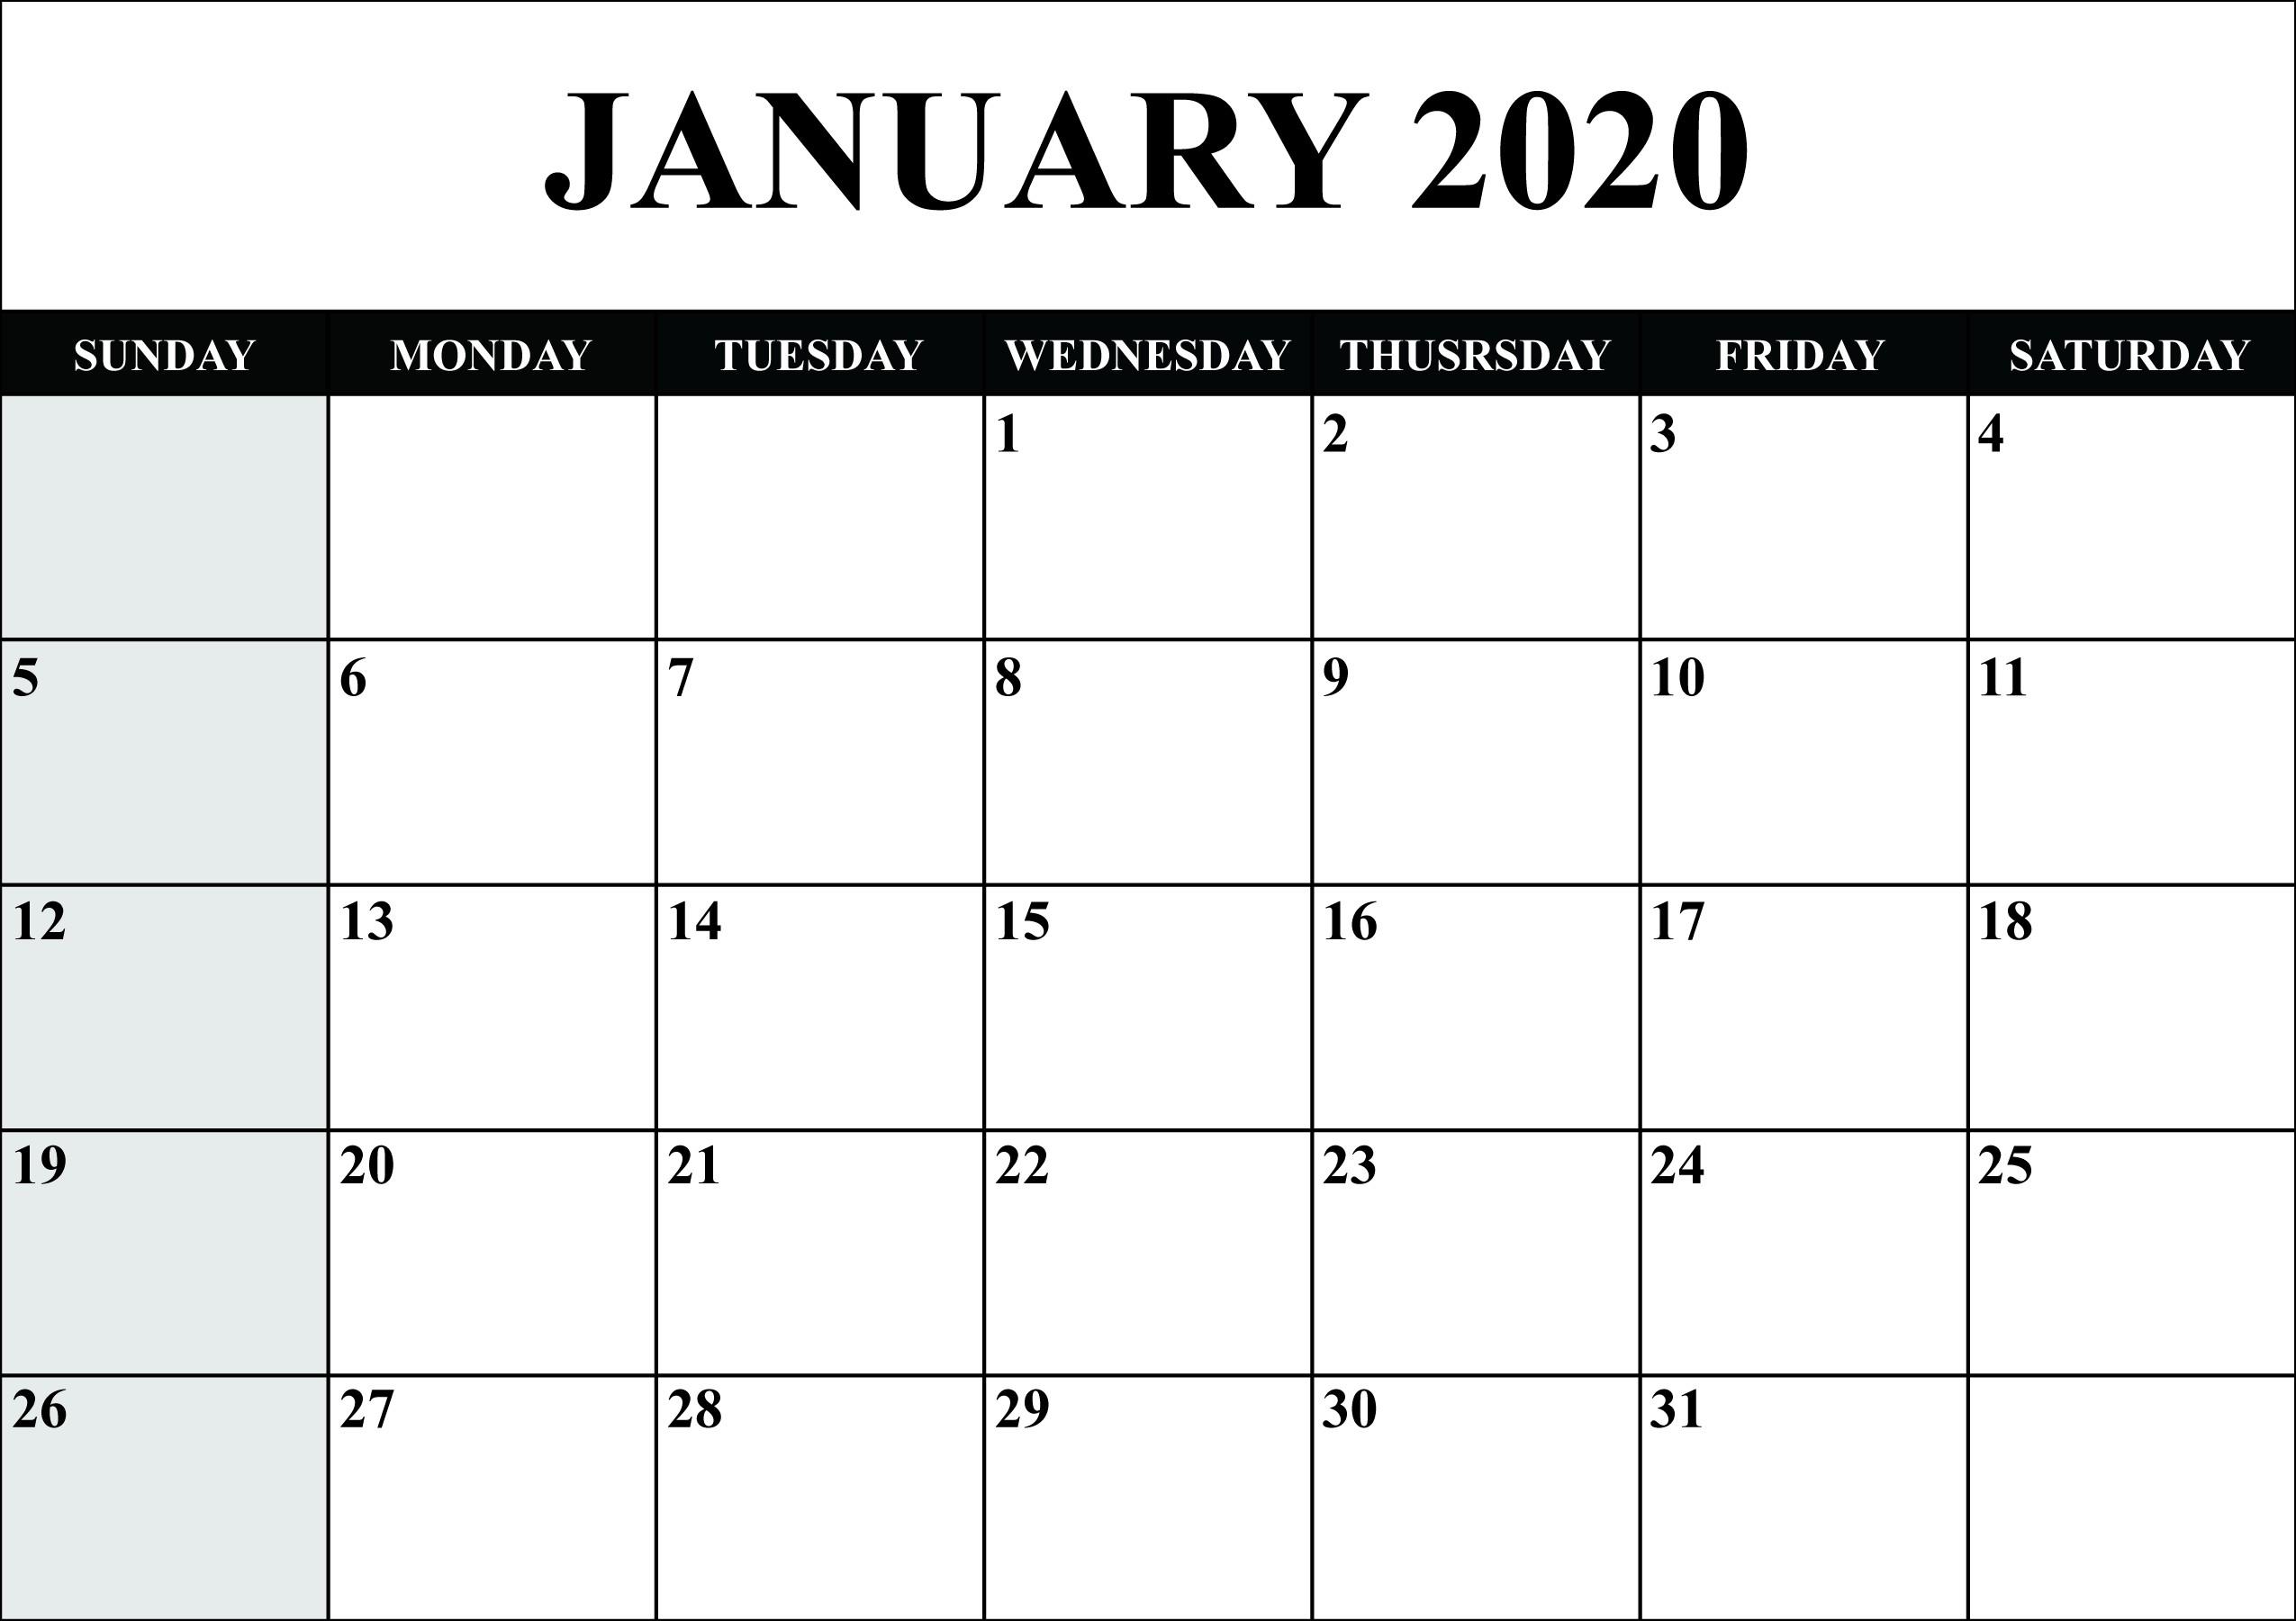 Free Printable 2020 Calendar Pdf Free Blank January 2020 Calendar Printable In Pdf Word